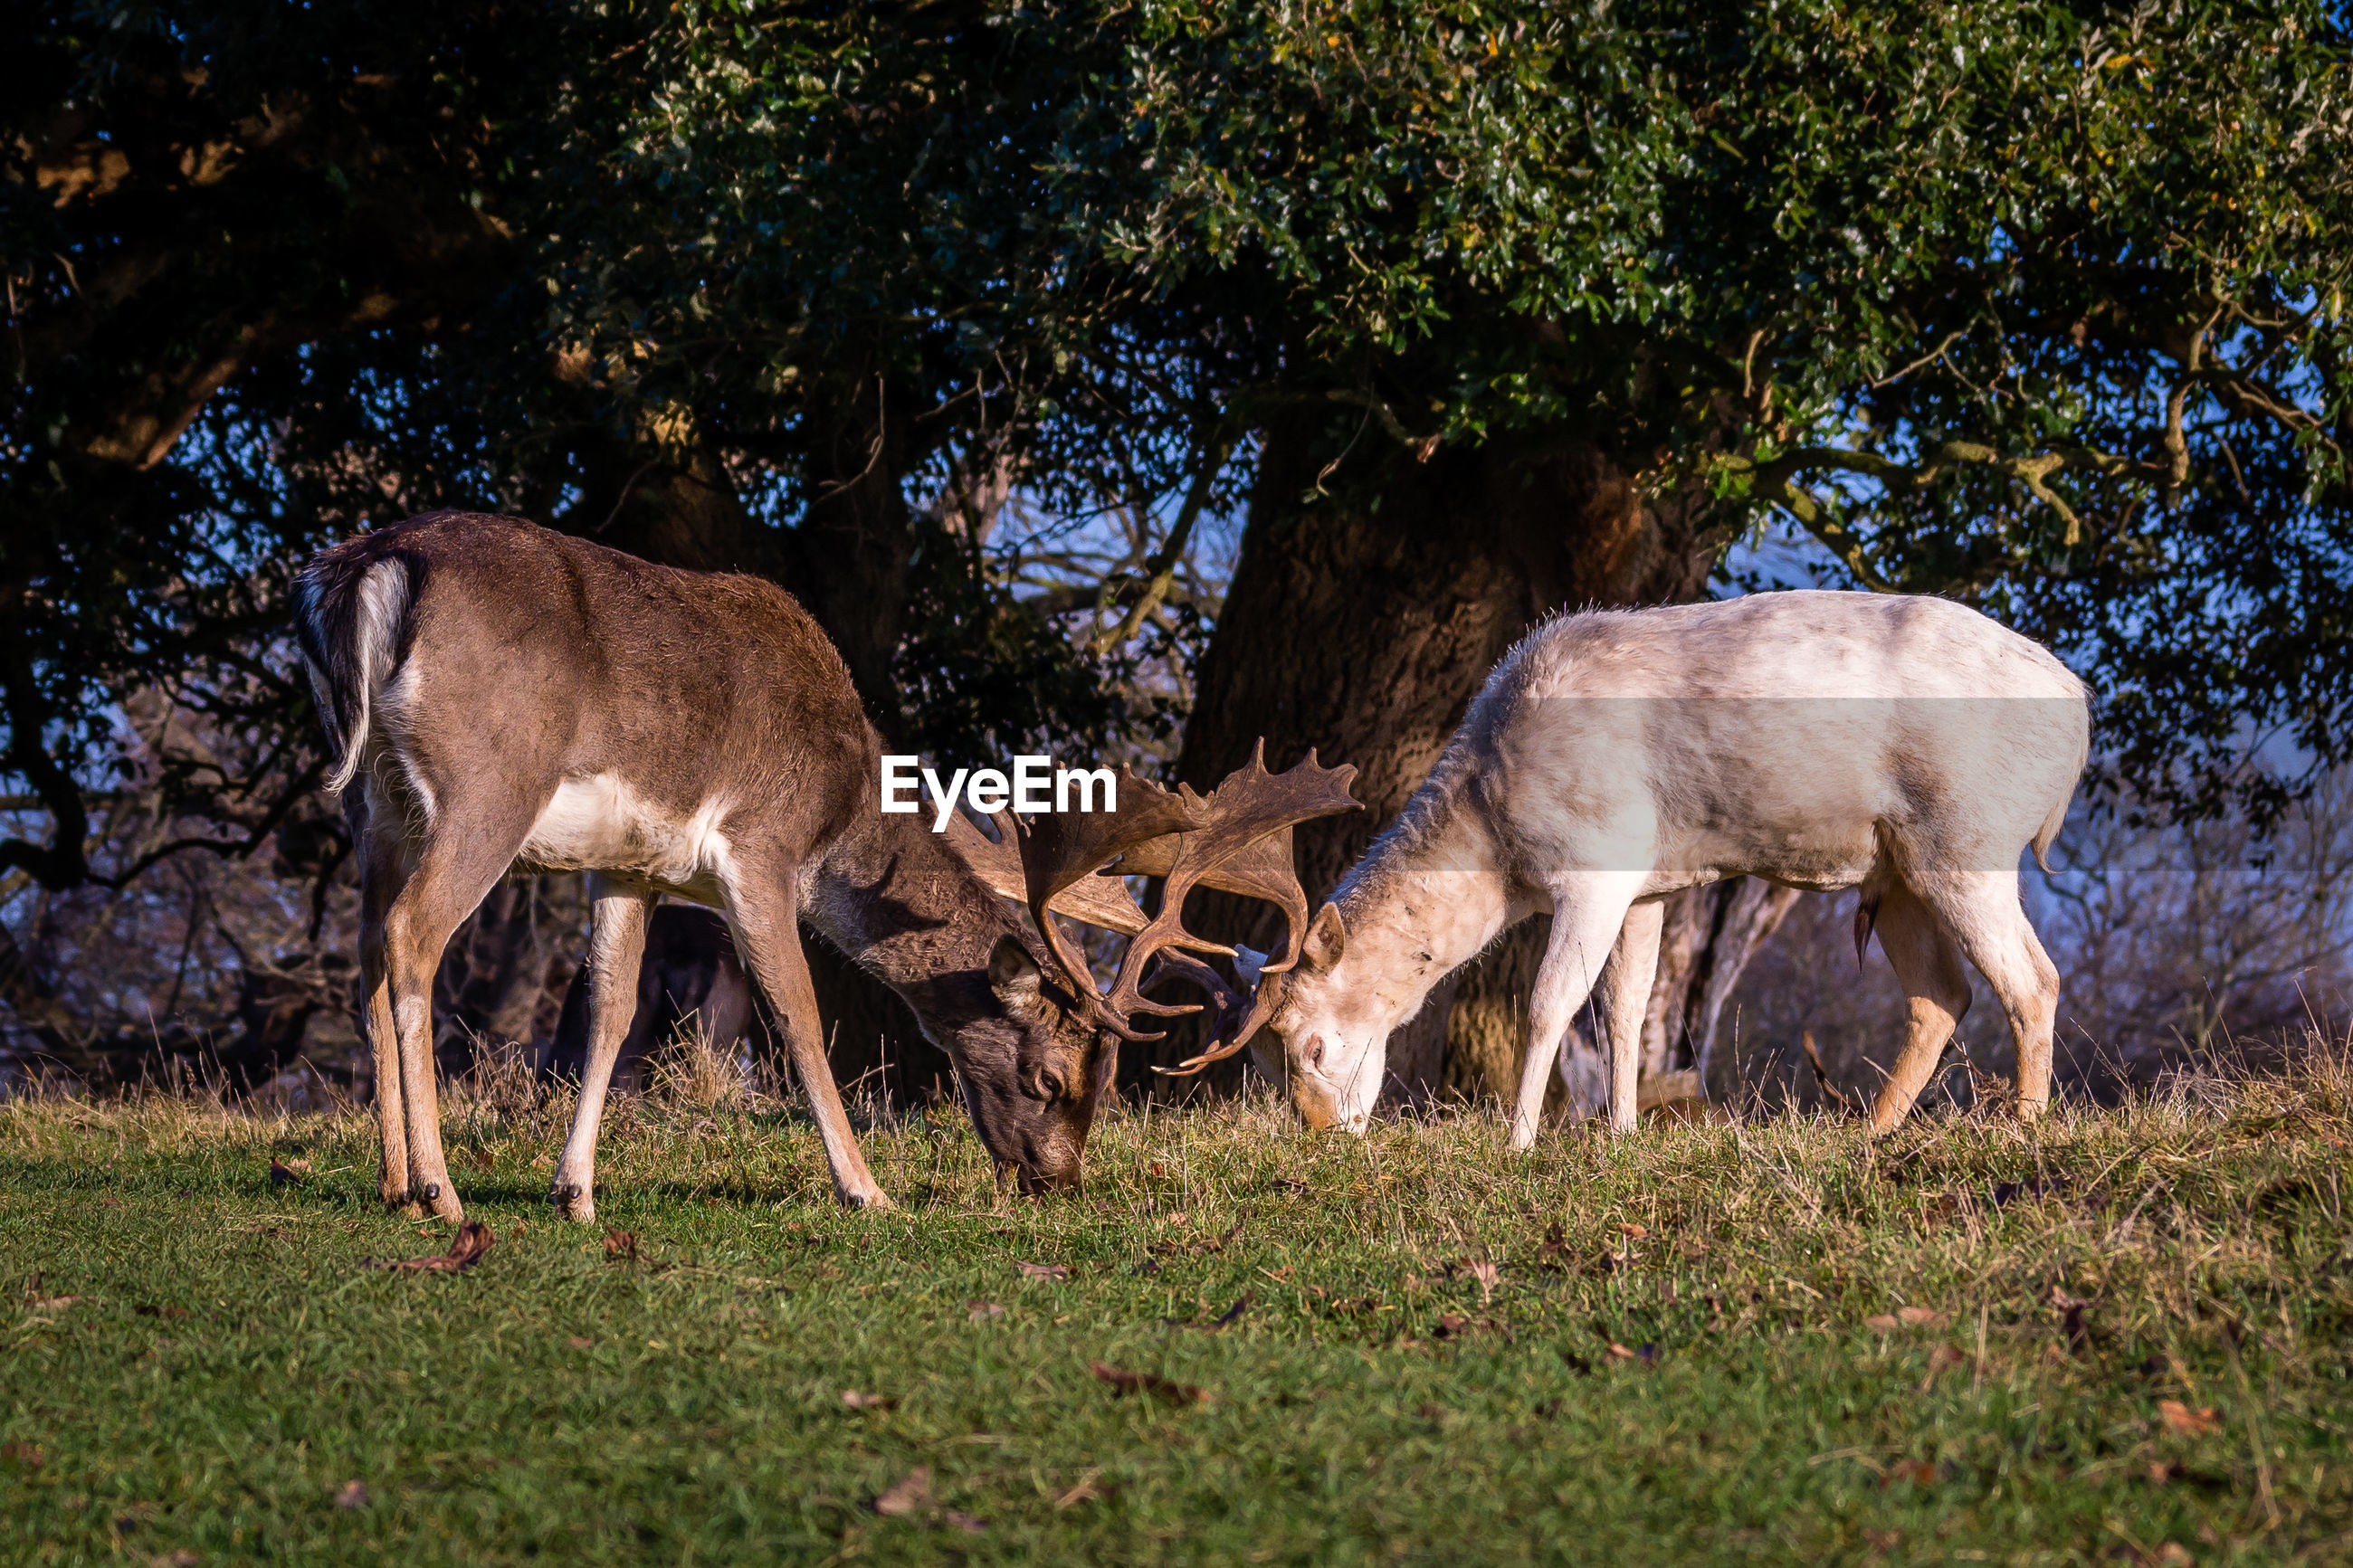 Deer grazing on grassy field